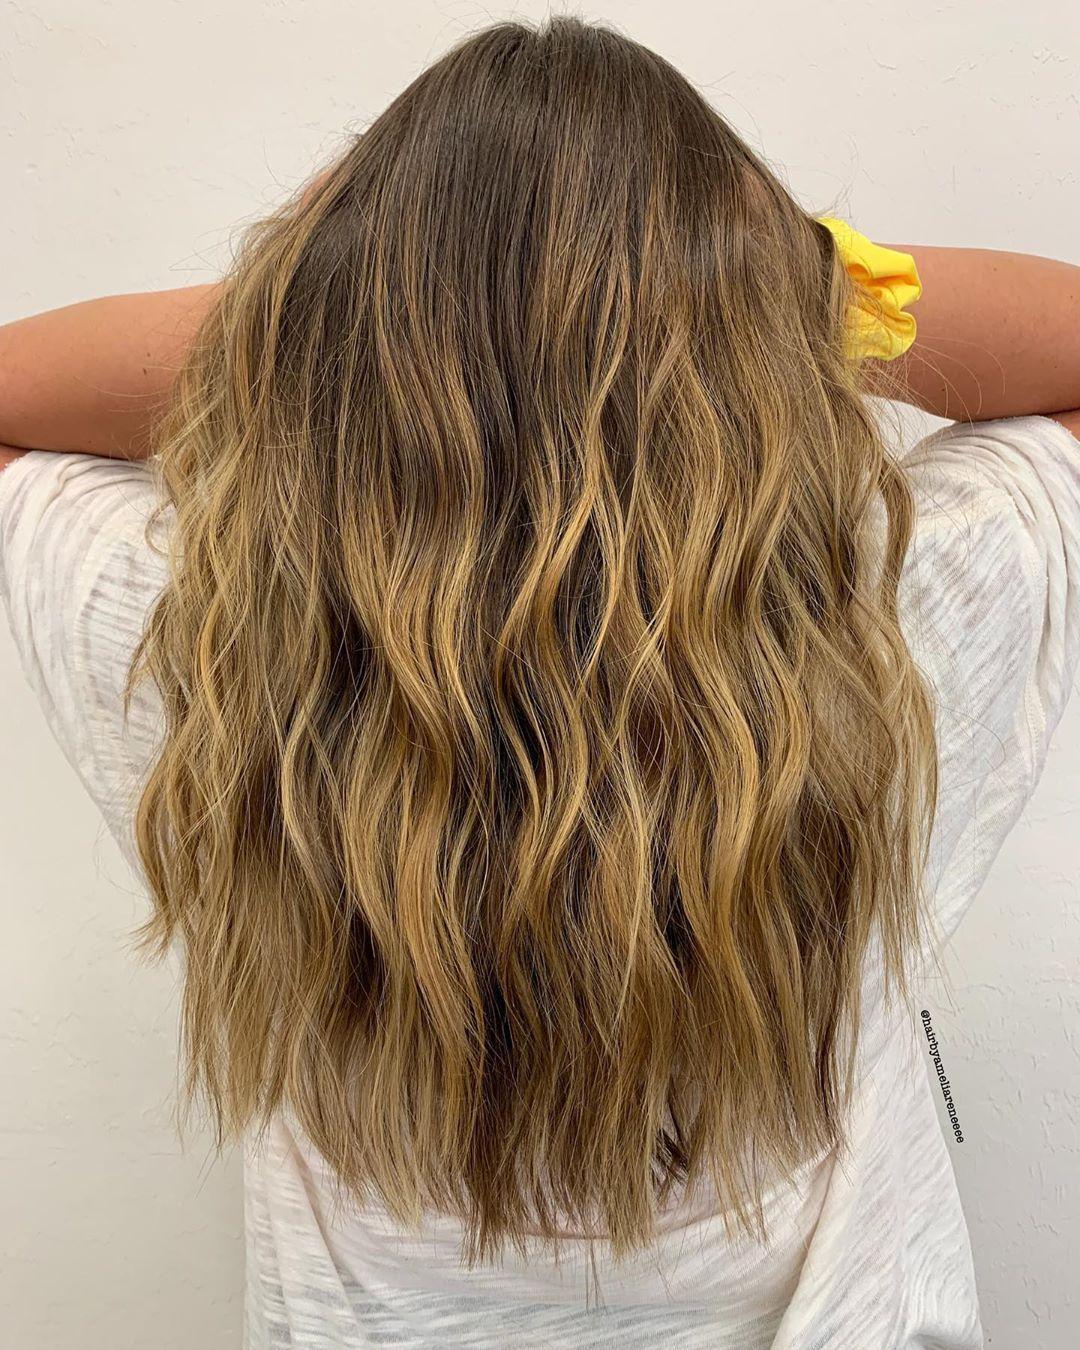 Come Get Ya Summa Time Hair Hair Long Hair Styles Beauty